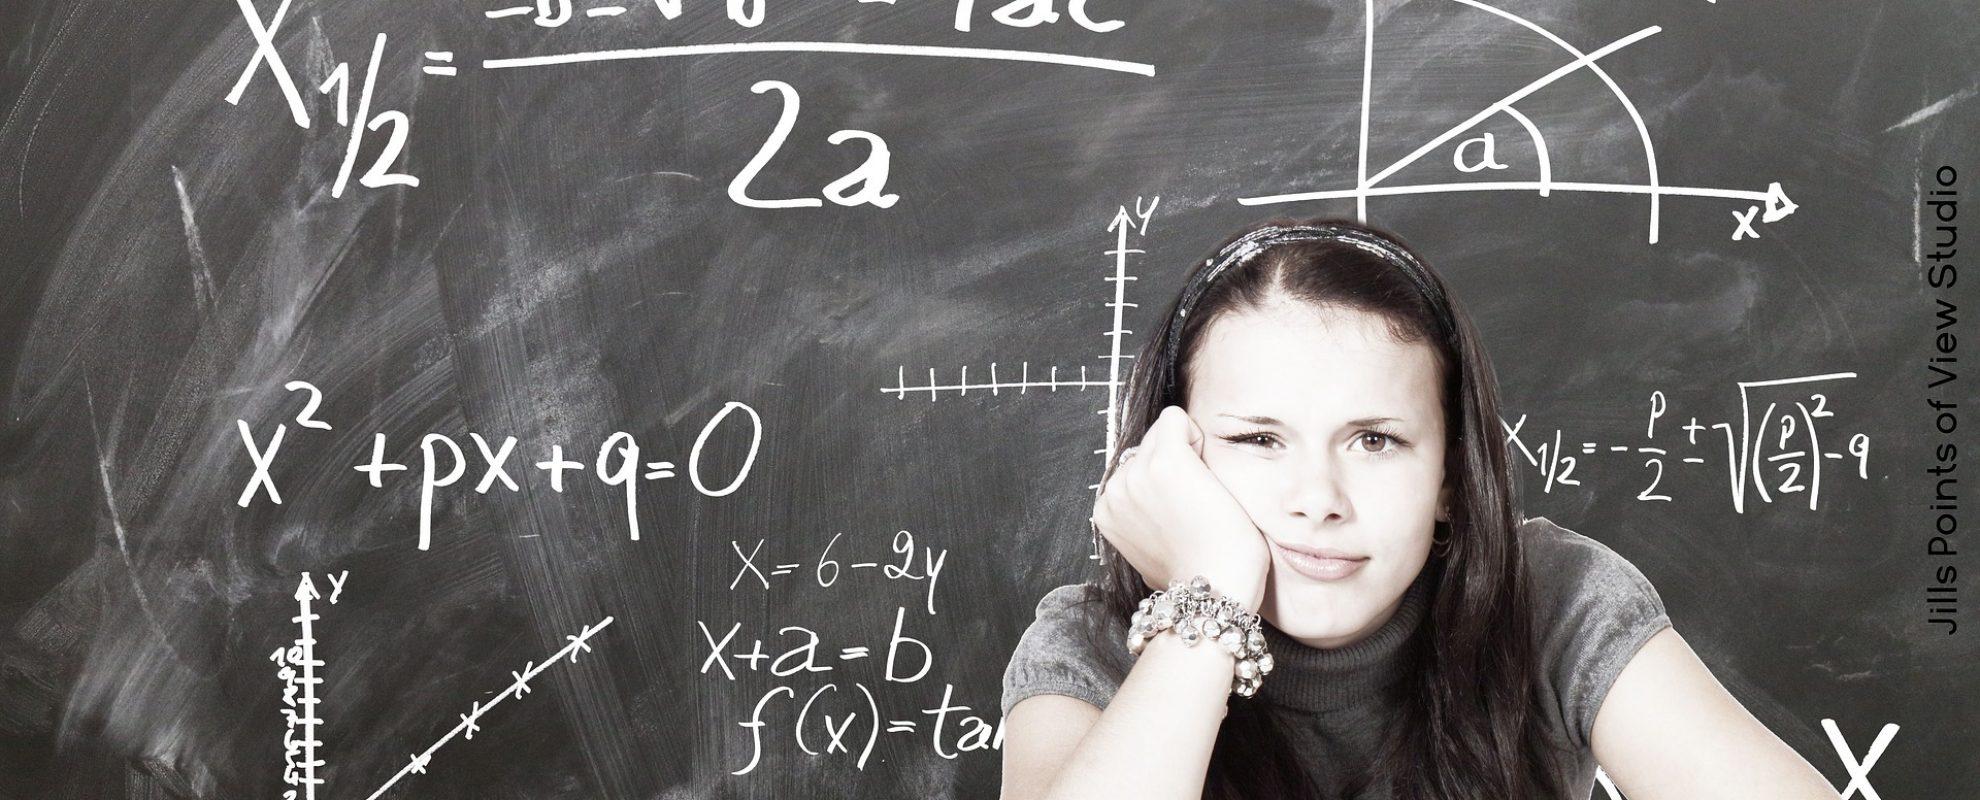 mathematics-3742914_1920